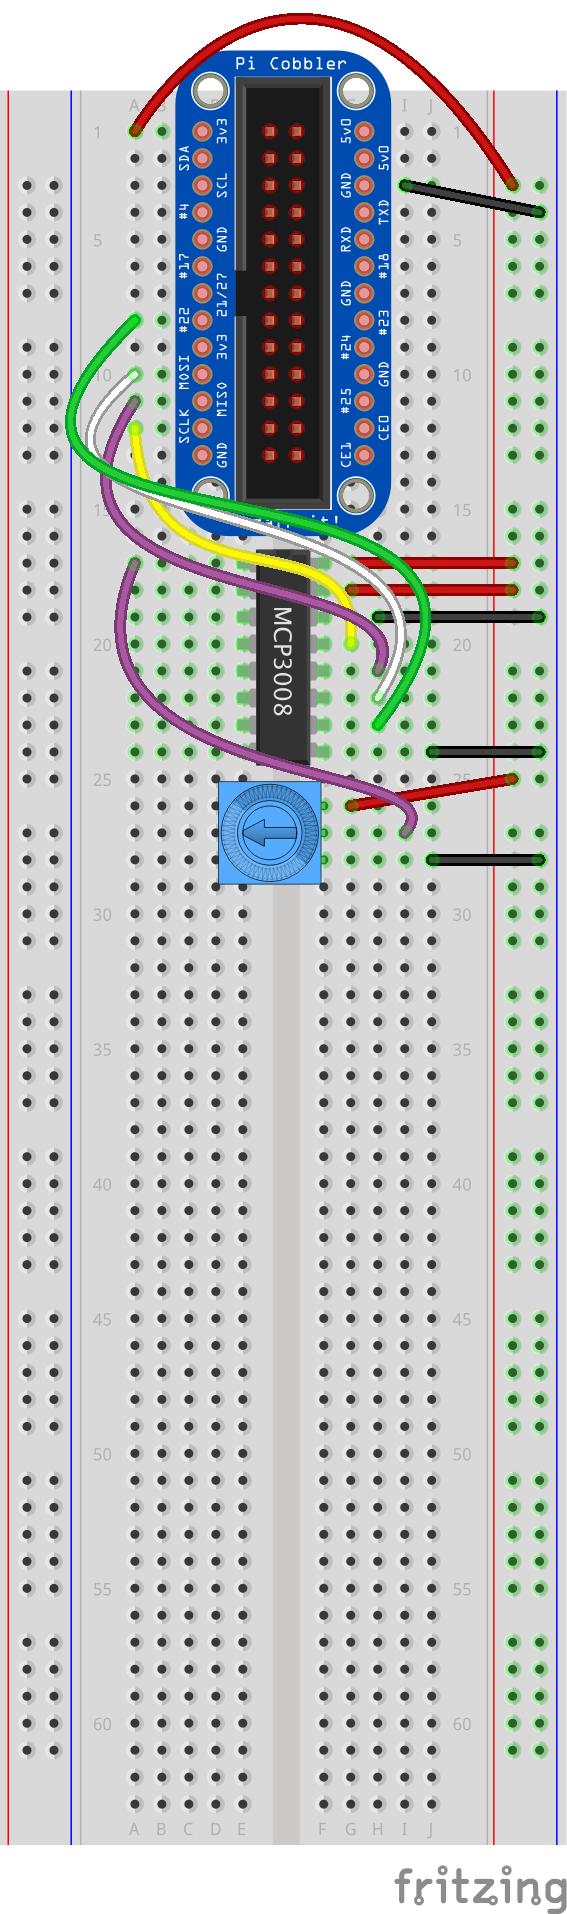 learn_raspberry_pi_Analog_Inputs_for_Raspberry_Pi_Using_the_MCP3008-Pi-Cobbler_bb.png